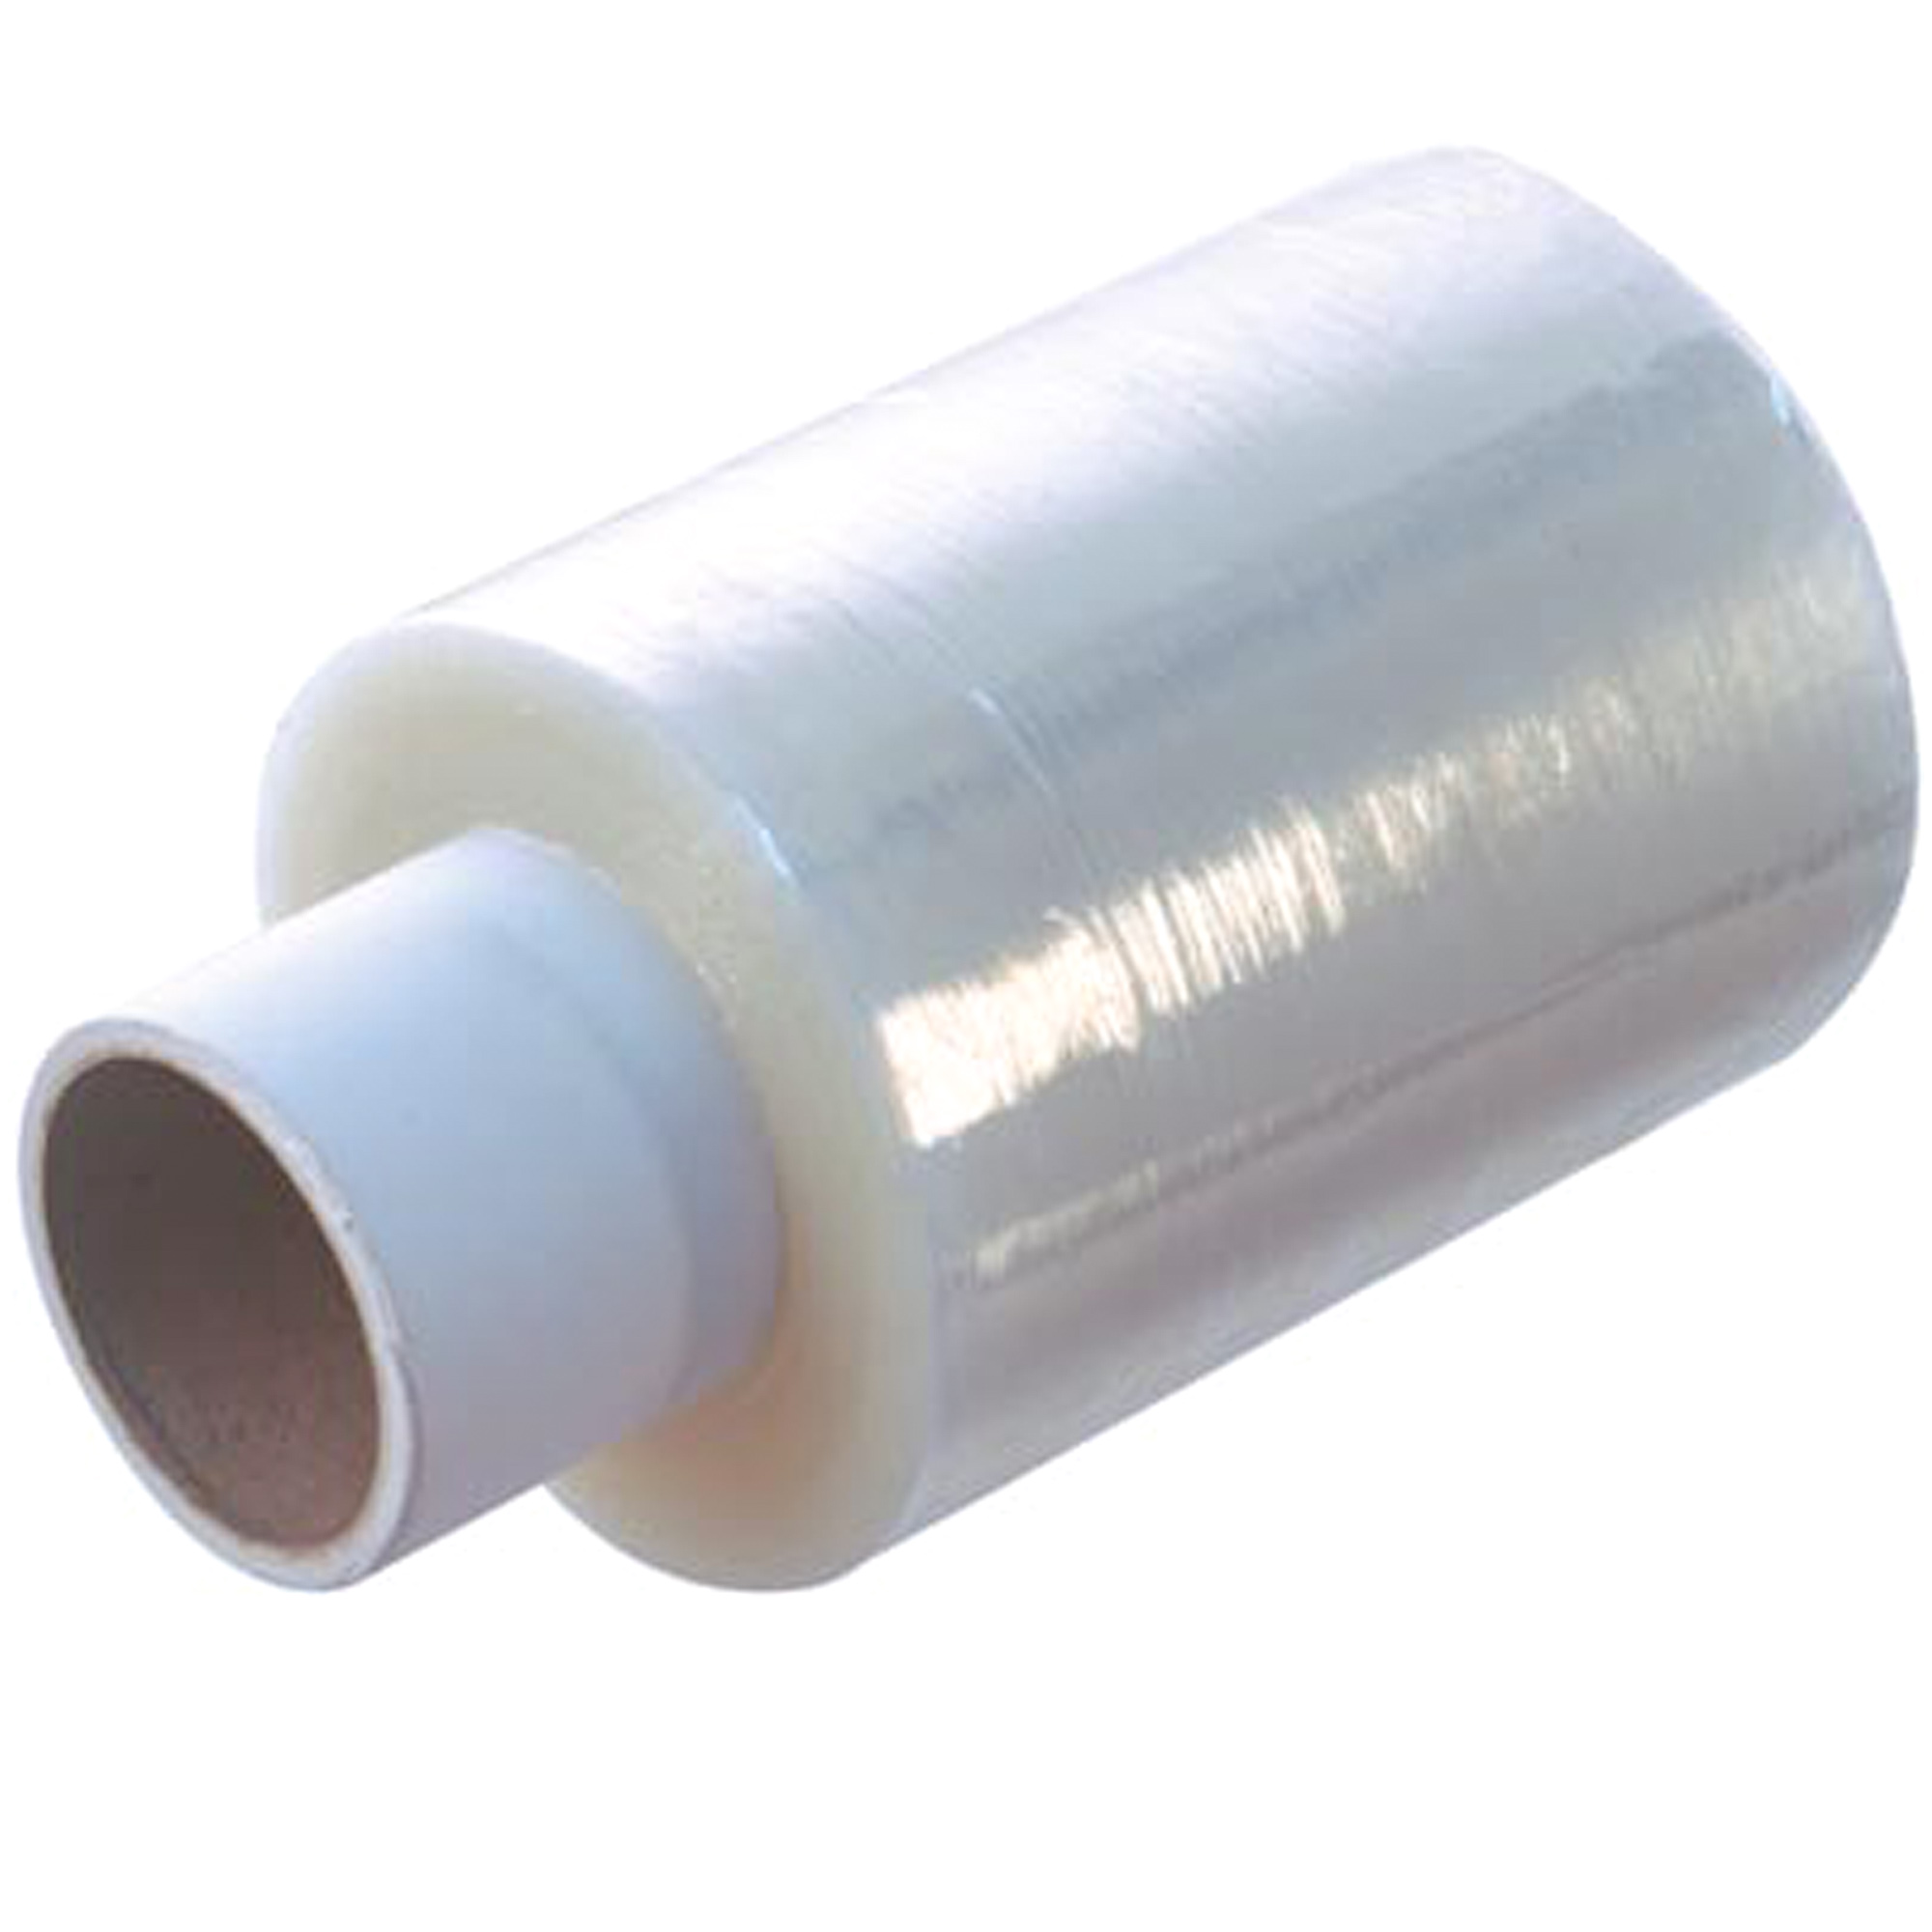 23mic Handy Mini Clear Pallet Wrap